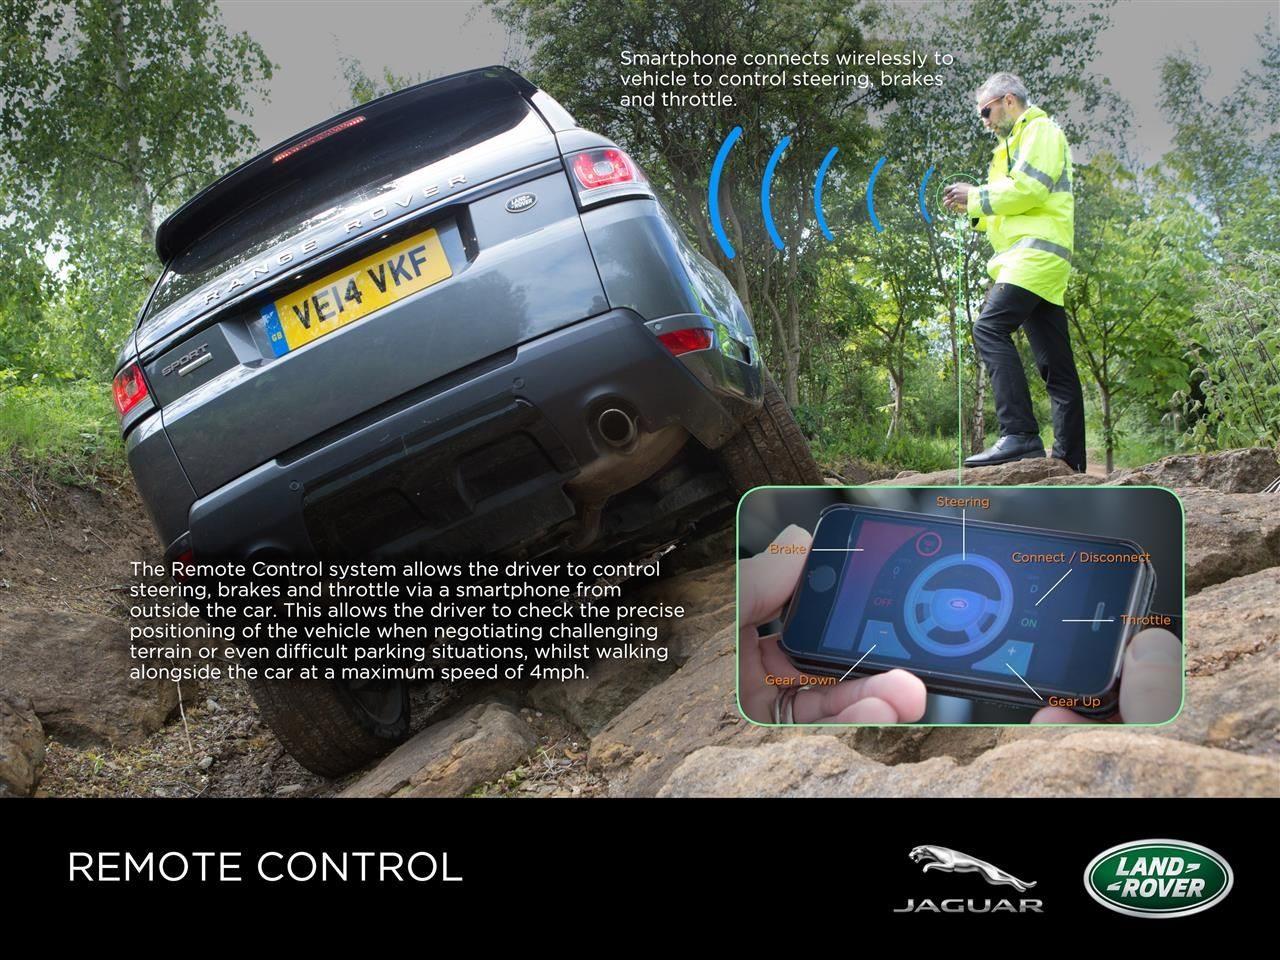 Range-Rover-Sport-remote-control-001.jpg